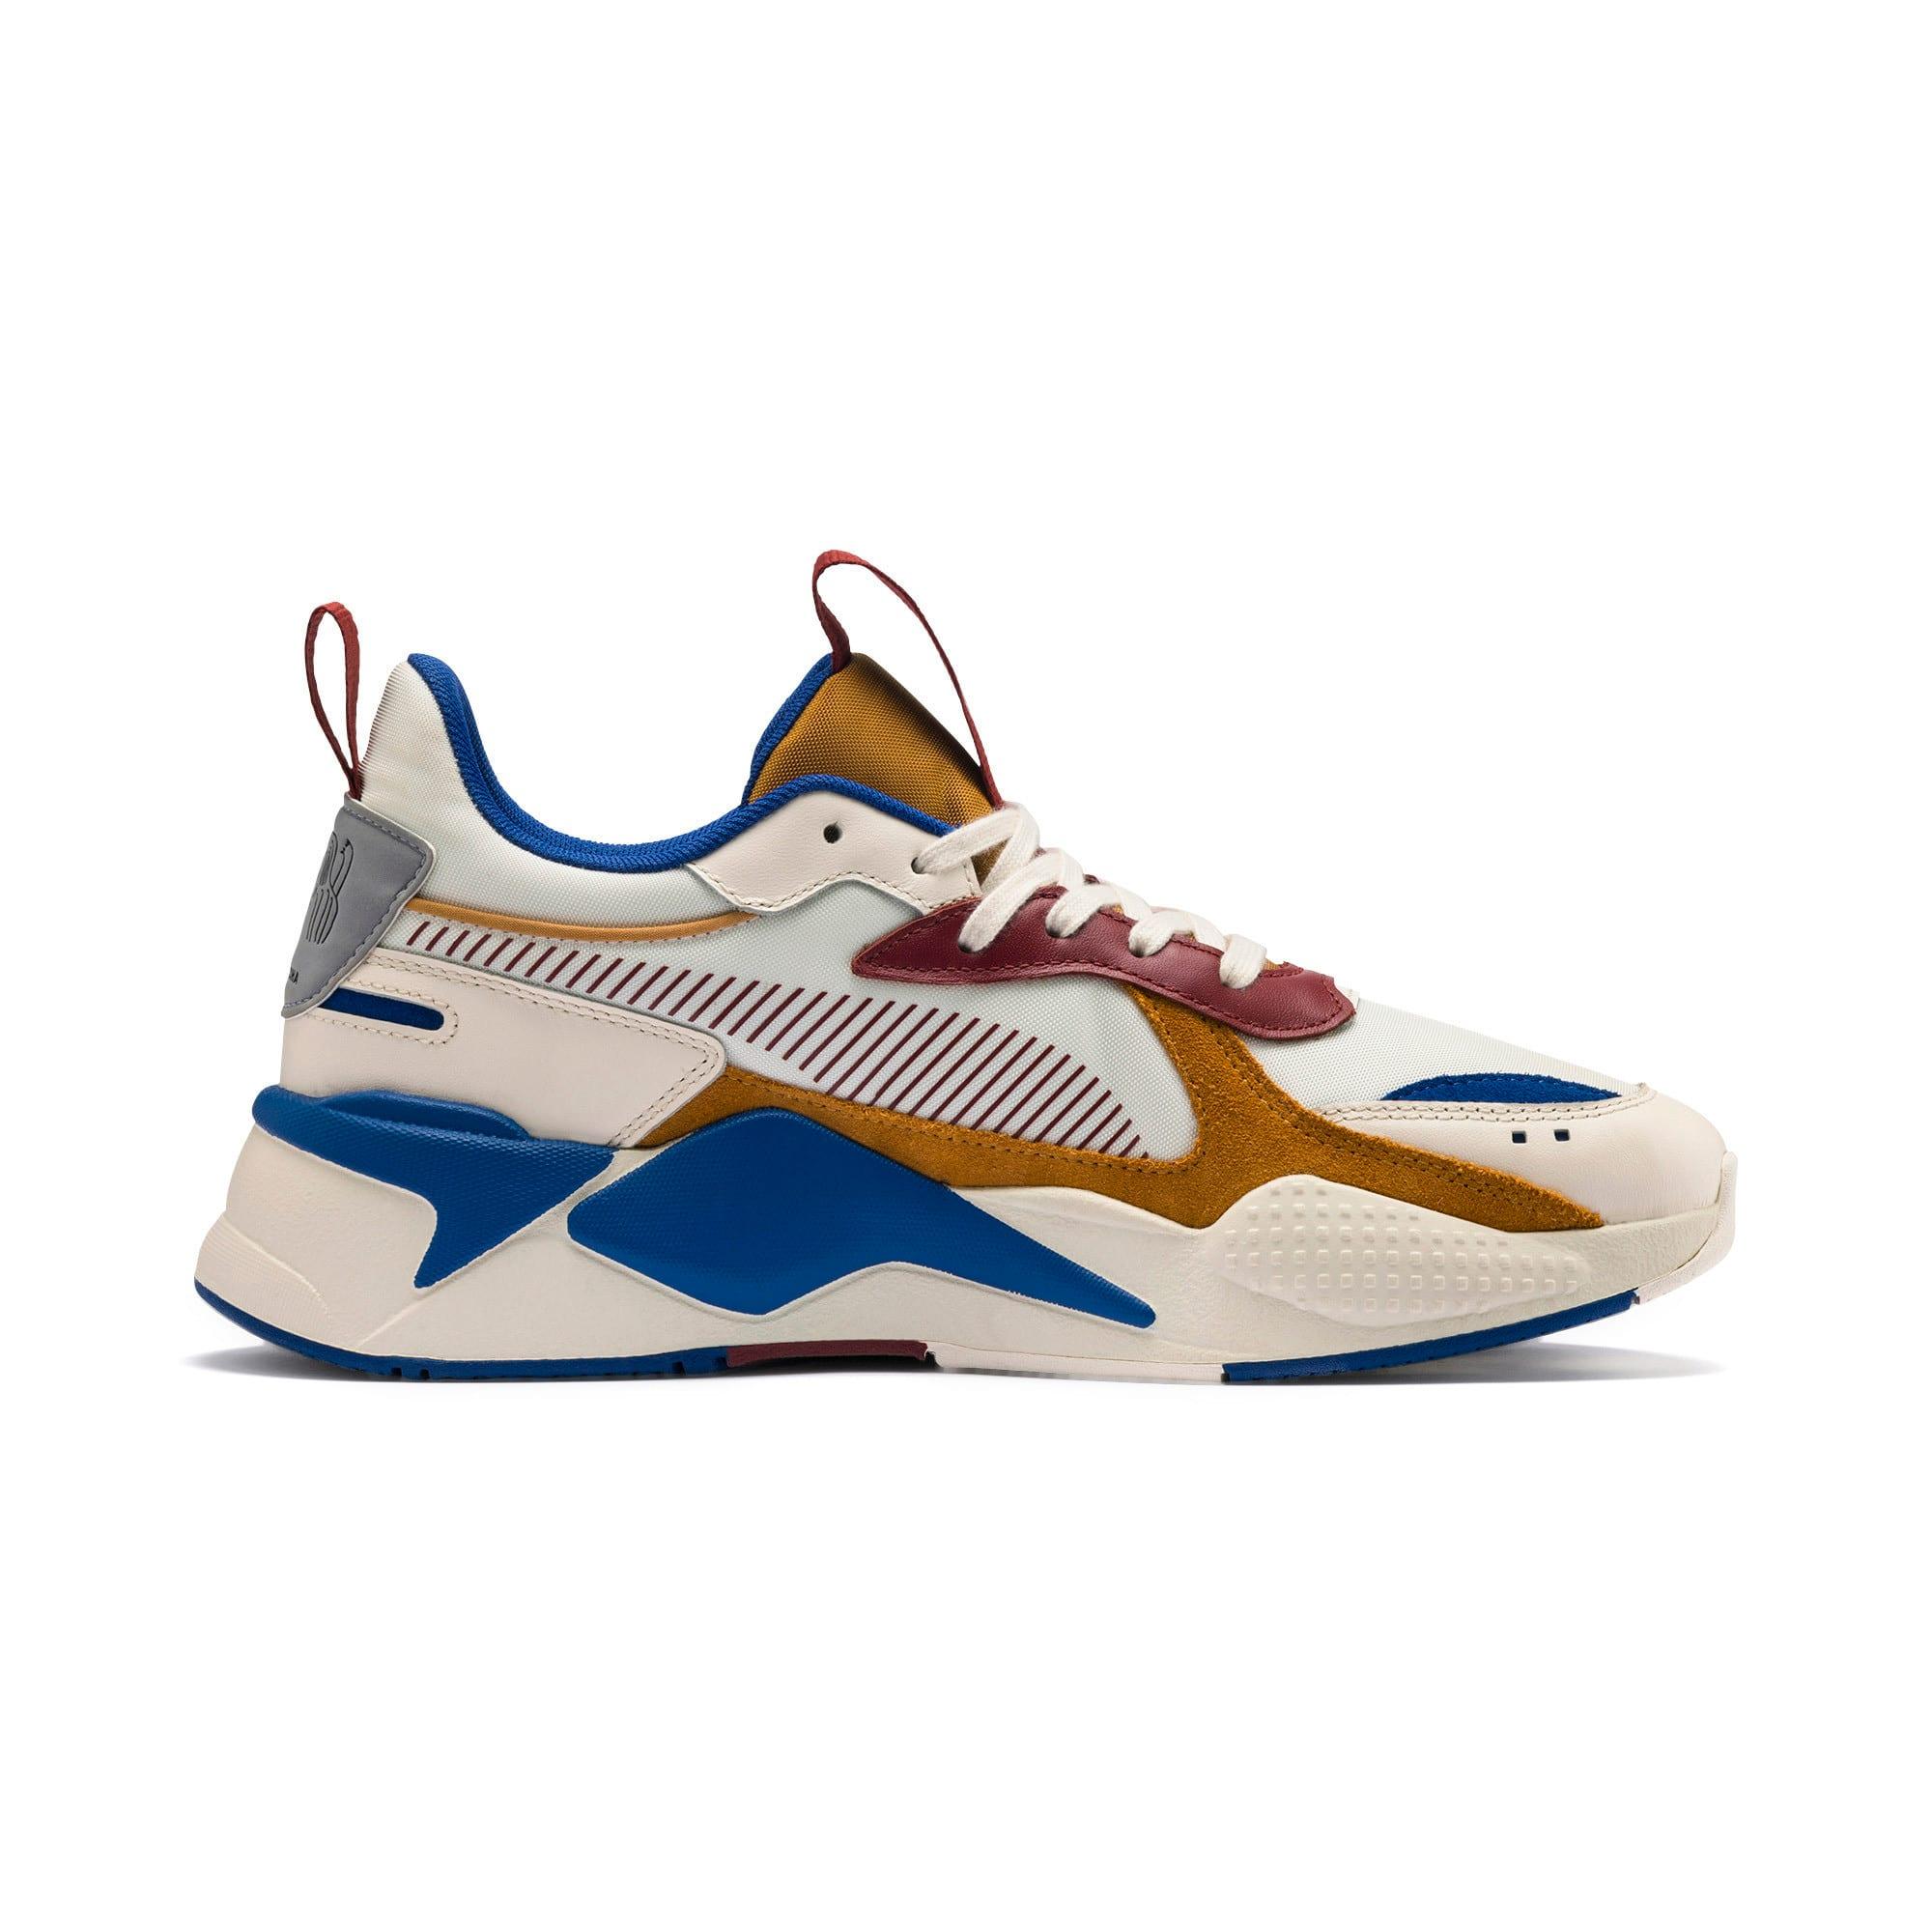 Thumbnail 7 of PUMA x TYAKASHA RS-X Sneakers, Whisper White-Fired Brick, medium